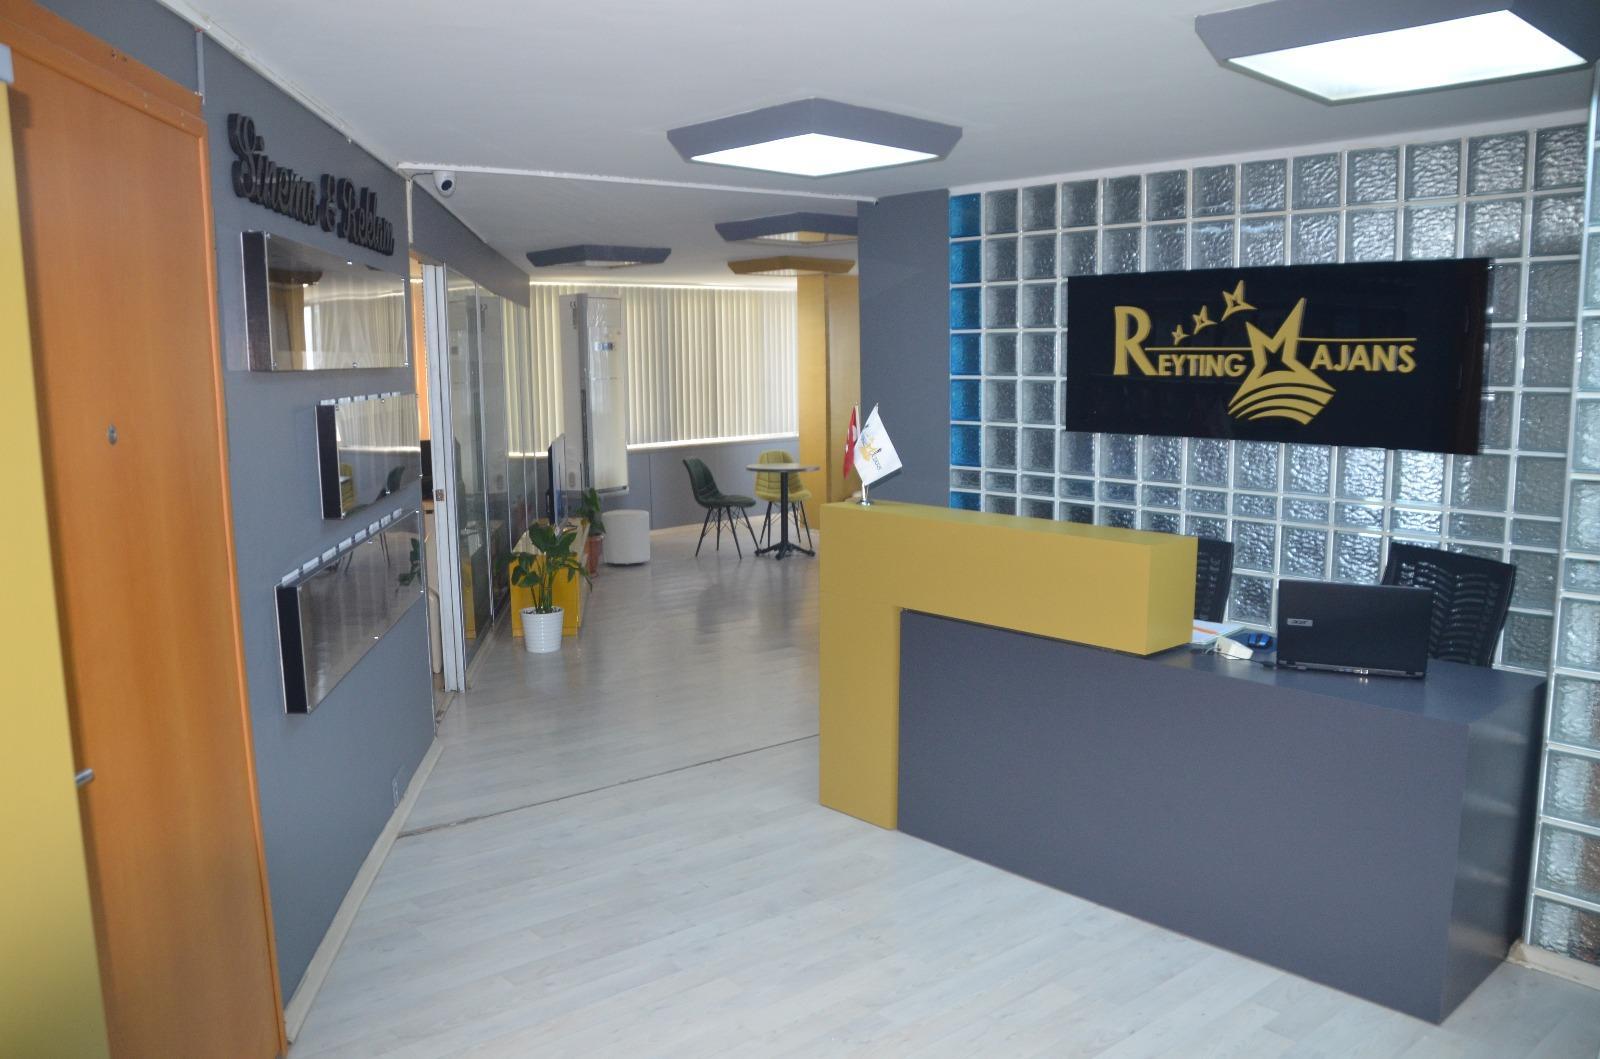 pagesss-95-reytingajans_ofisi_2